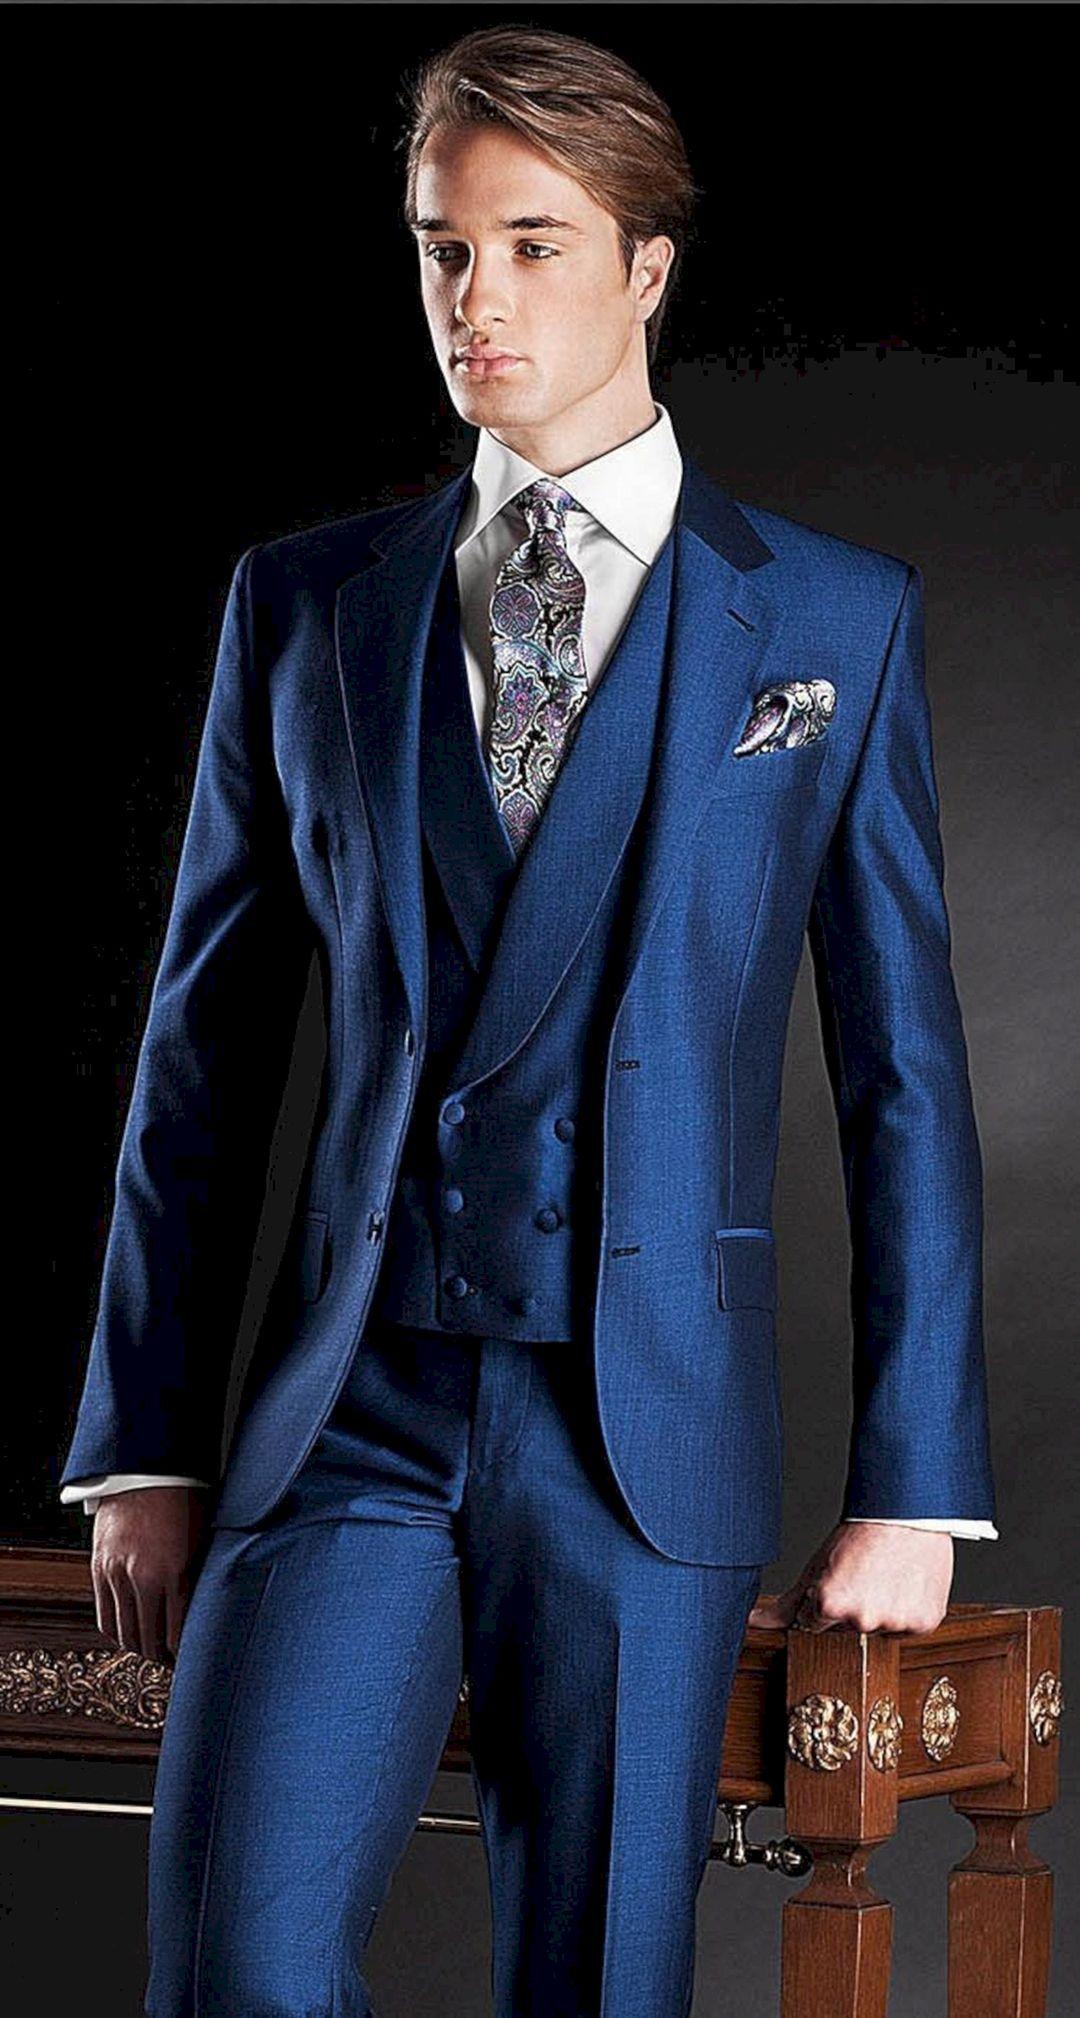 mens wedding tuxedo ideas